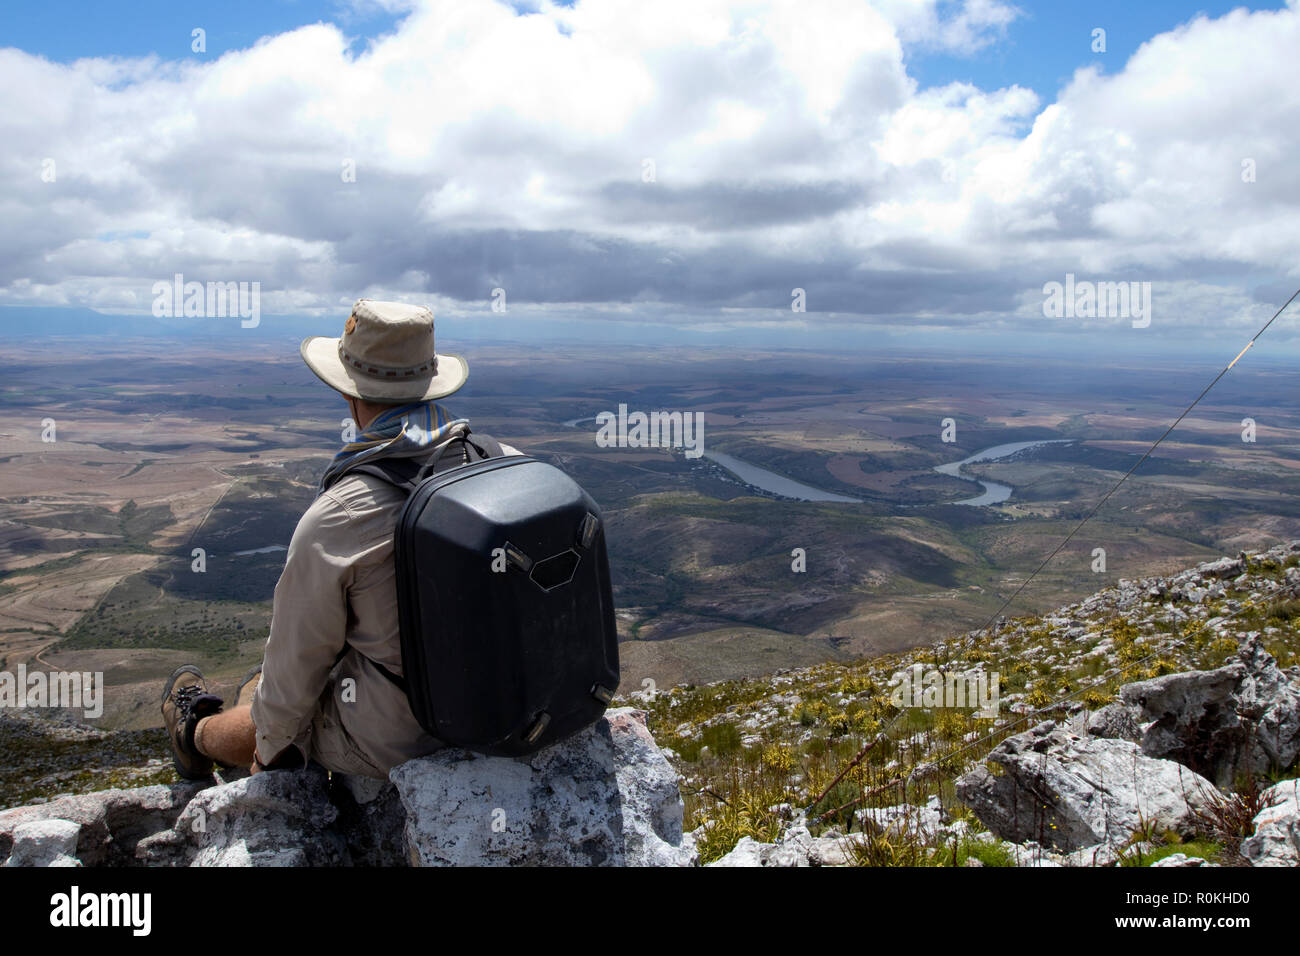 Man sitting picturesque landscape of the De Hoop Nature Reserve - Stock Image